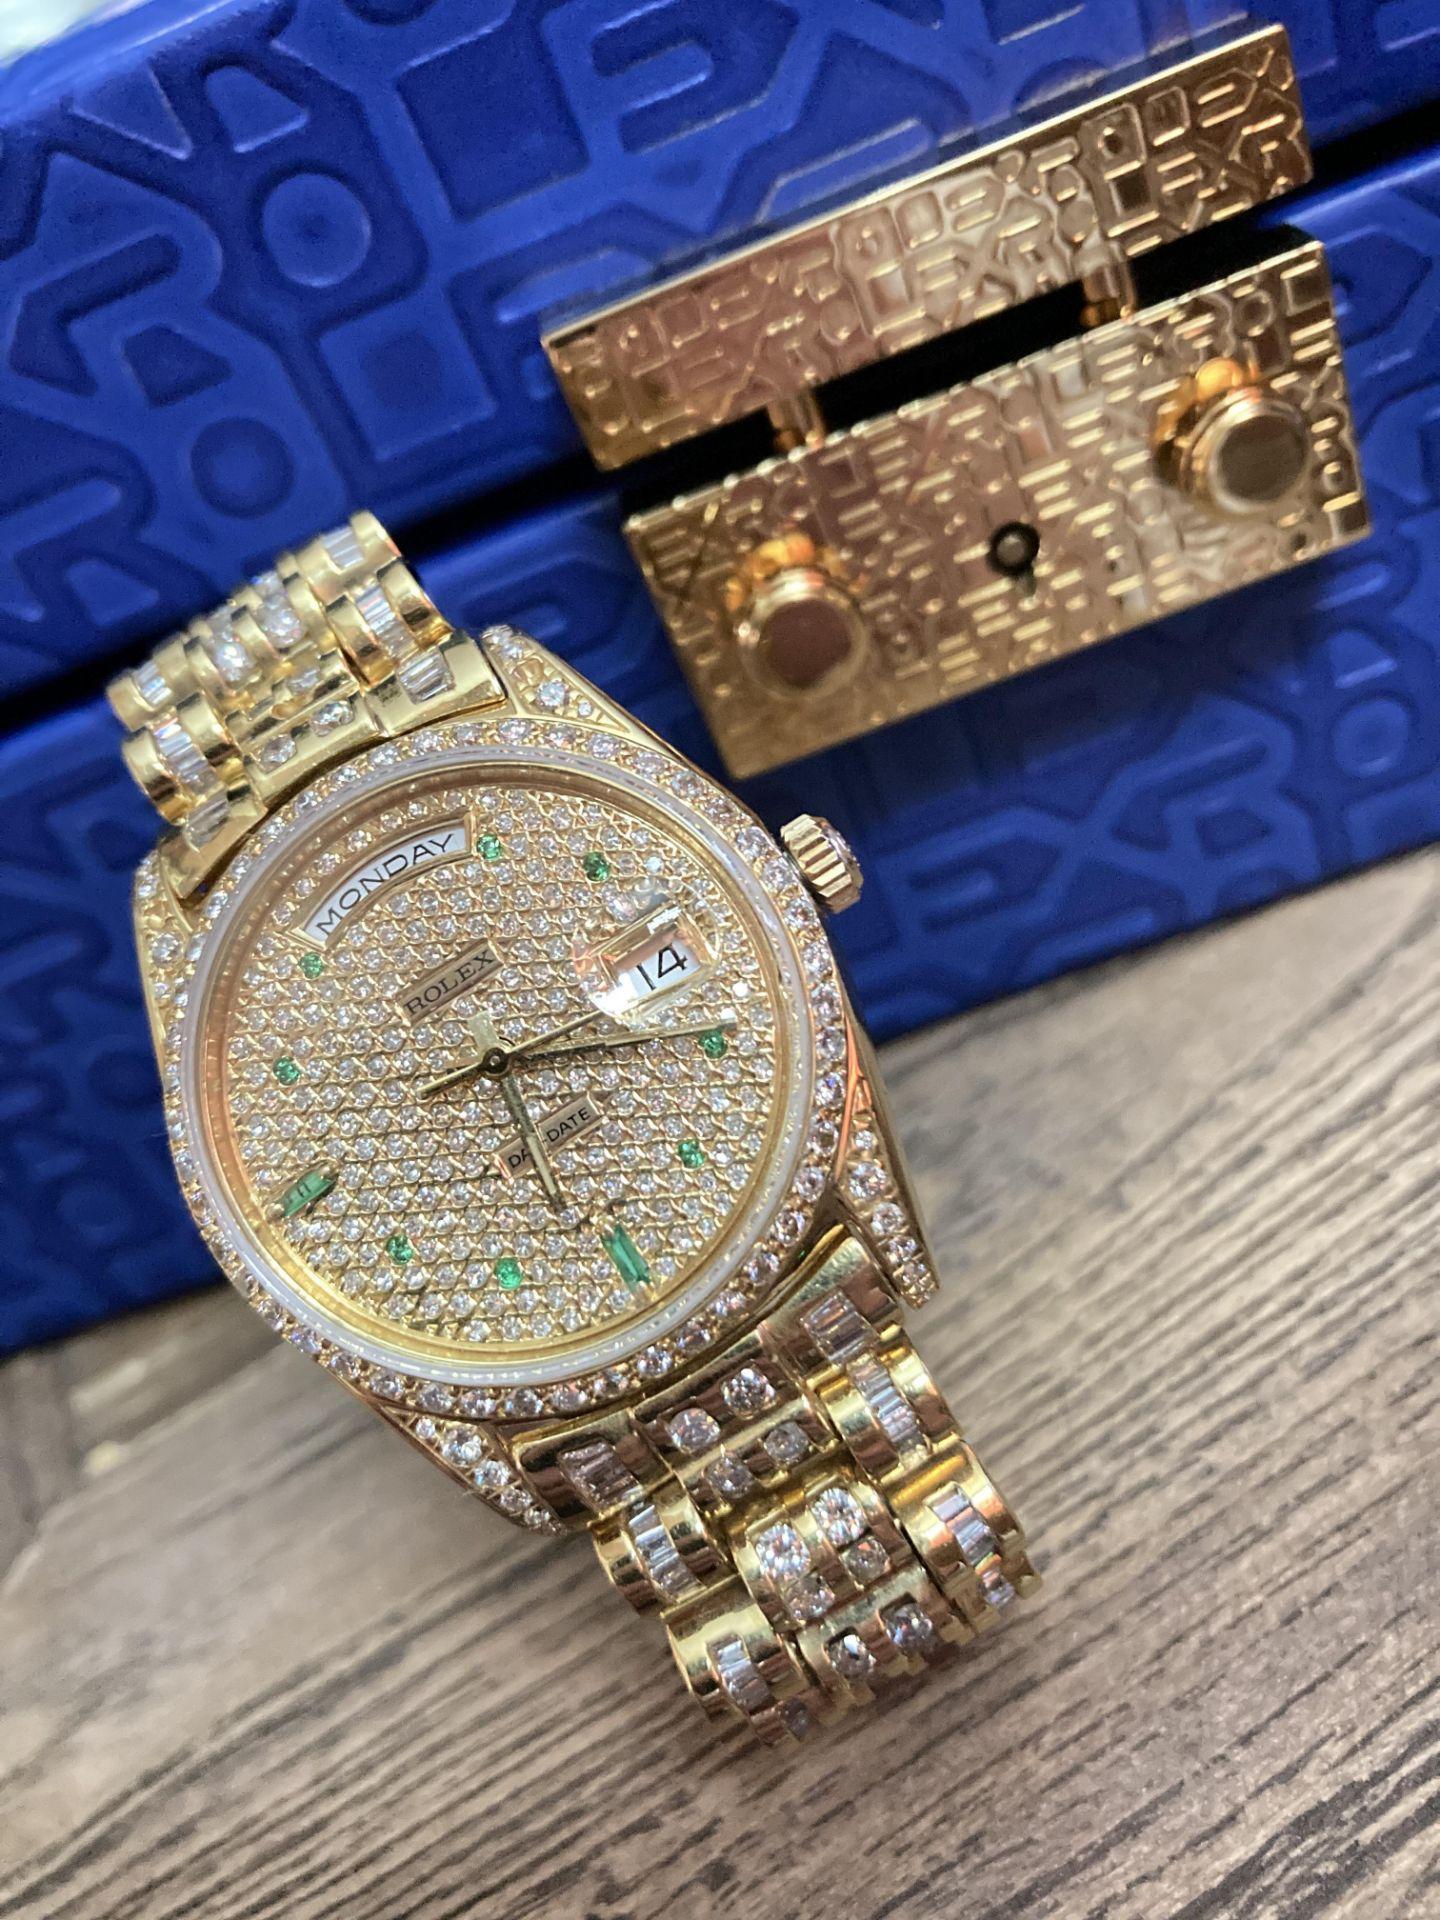 GENTS 36mm ROLEX DAYDATE YELLOW GOLD DIAMOND WATCH - Image 21 of 21